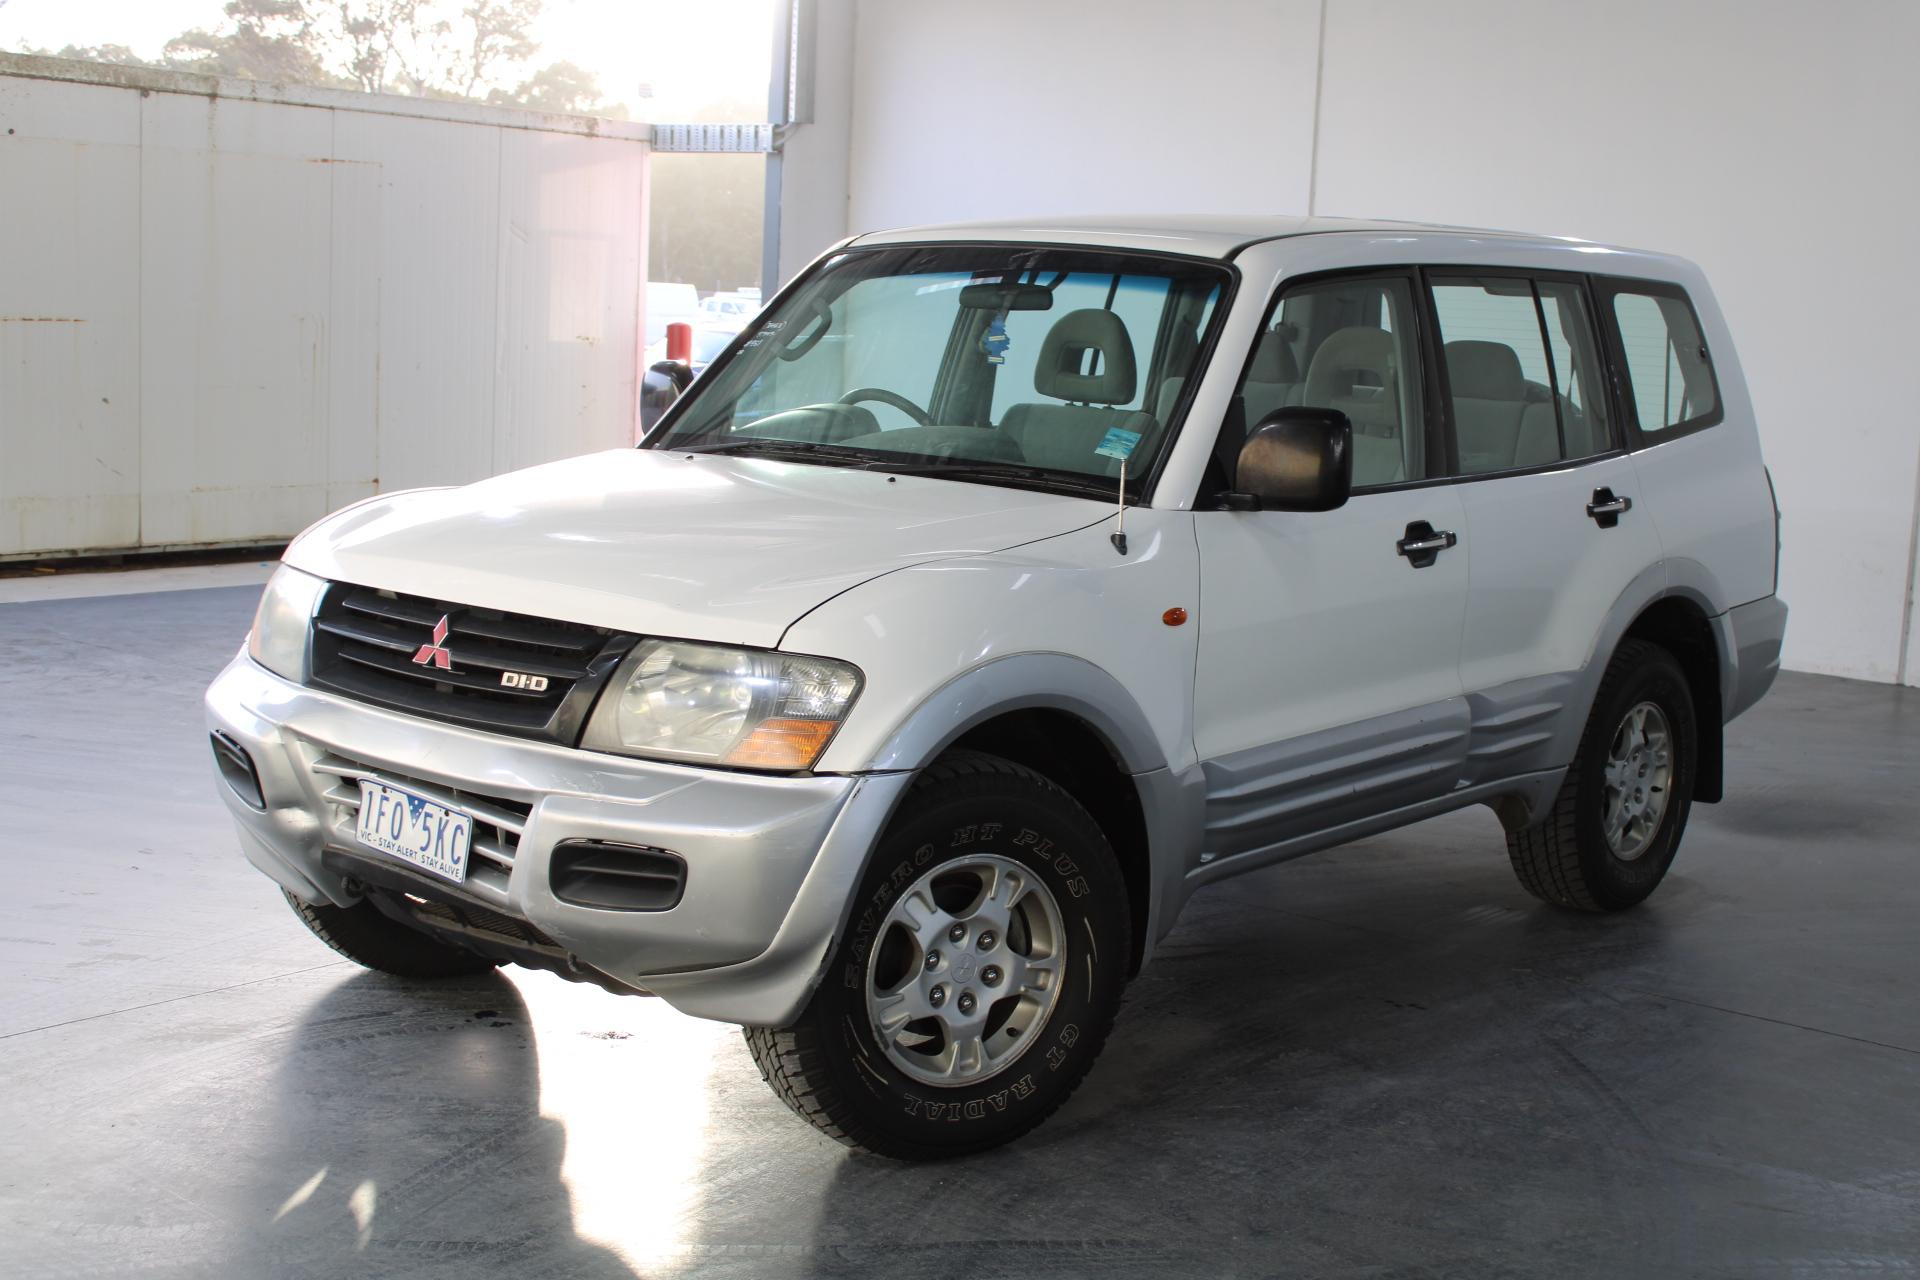 2002 Mitsubishi Pajero GLS LWB (4x4) NM Turbo Diesel Auto 7 Seats Wagon